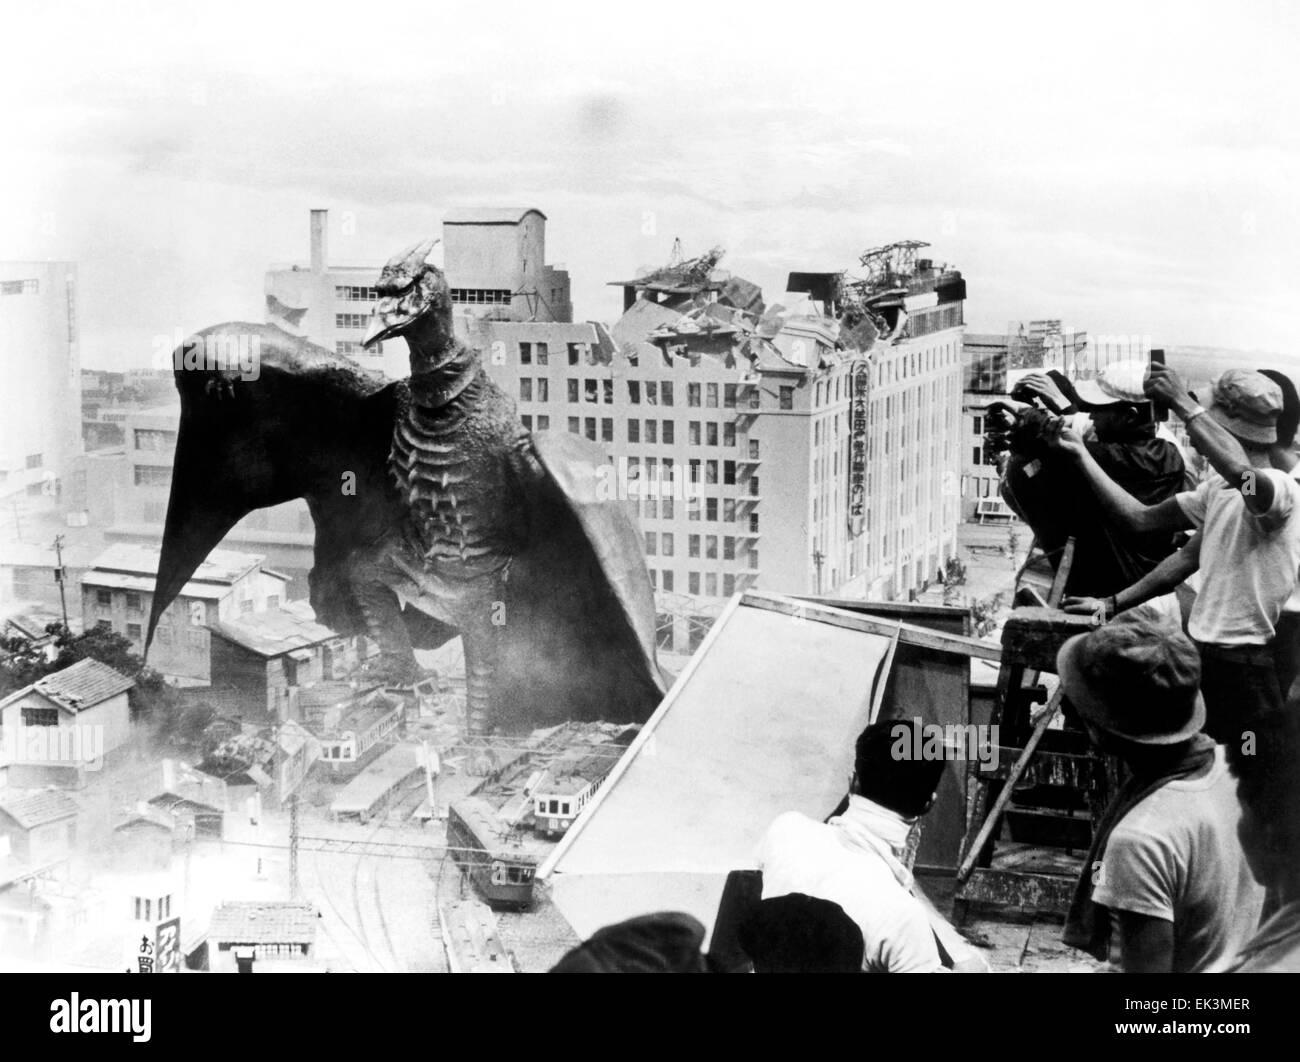 "Fliegende Kreatur zerstören Gebäude, am Set ""Rodan"" (aka Sora No Ländern Radon), 1956 Stockbild"